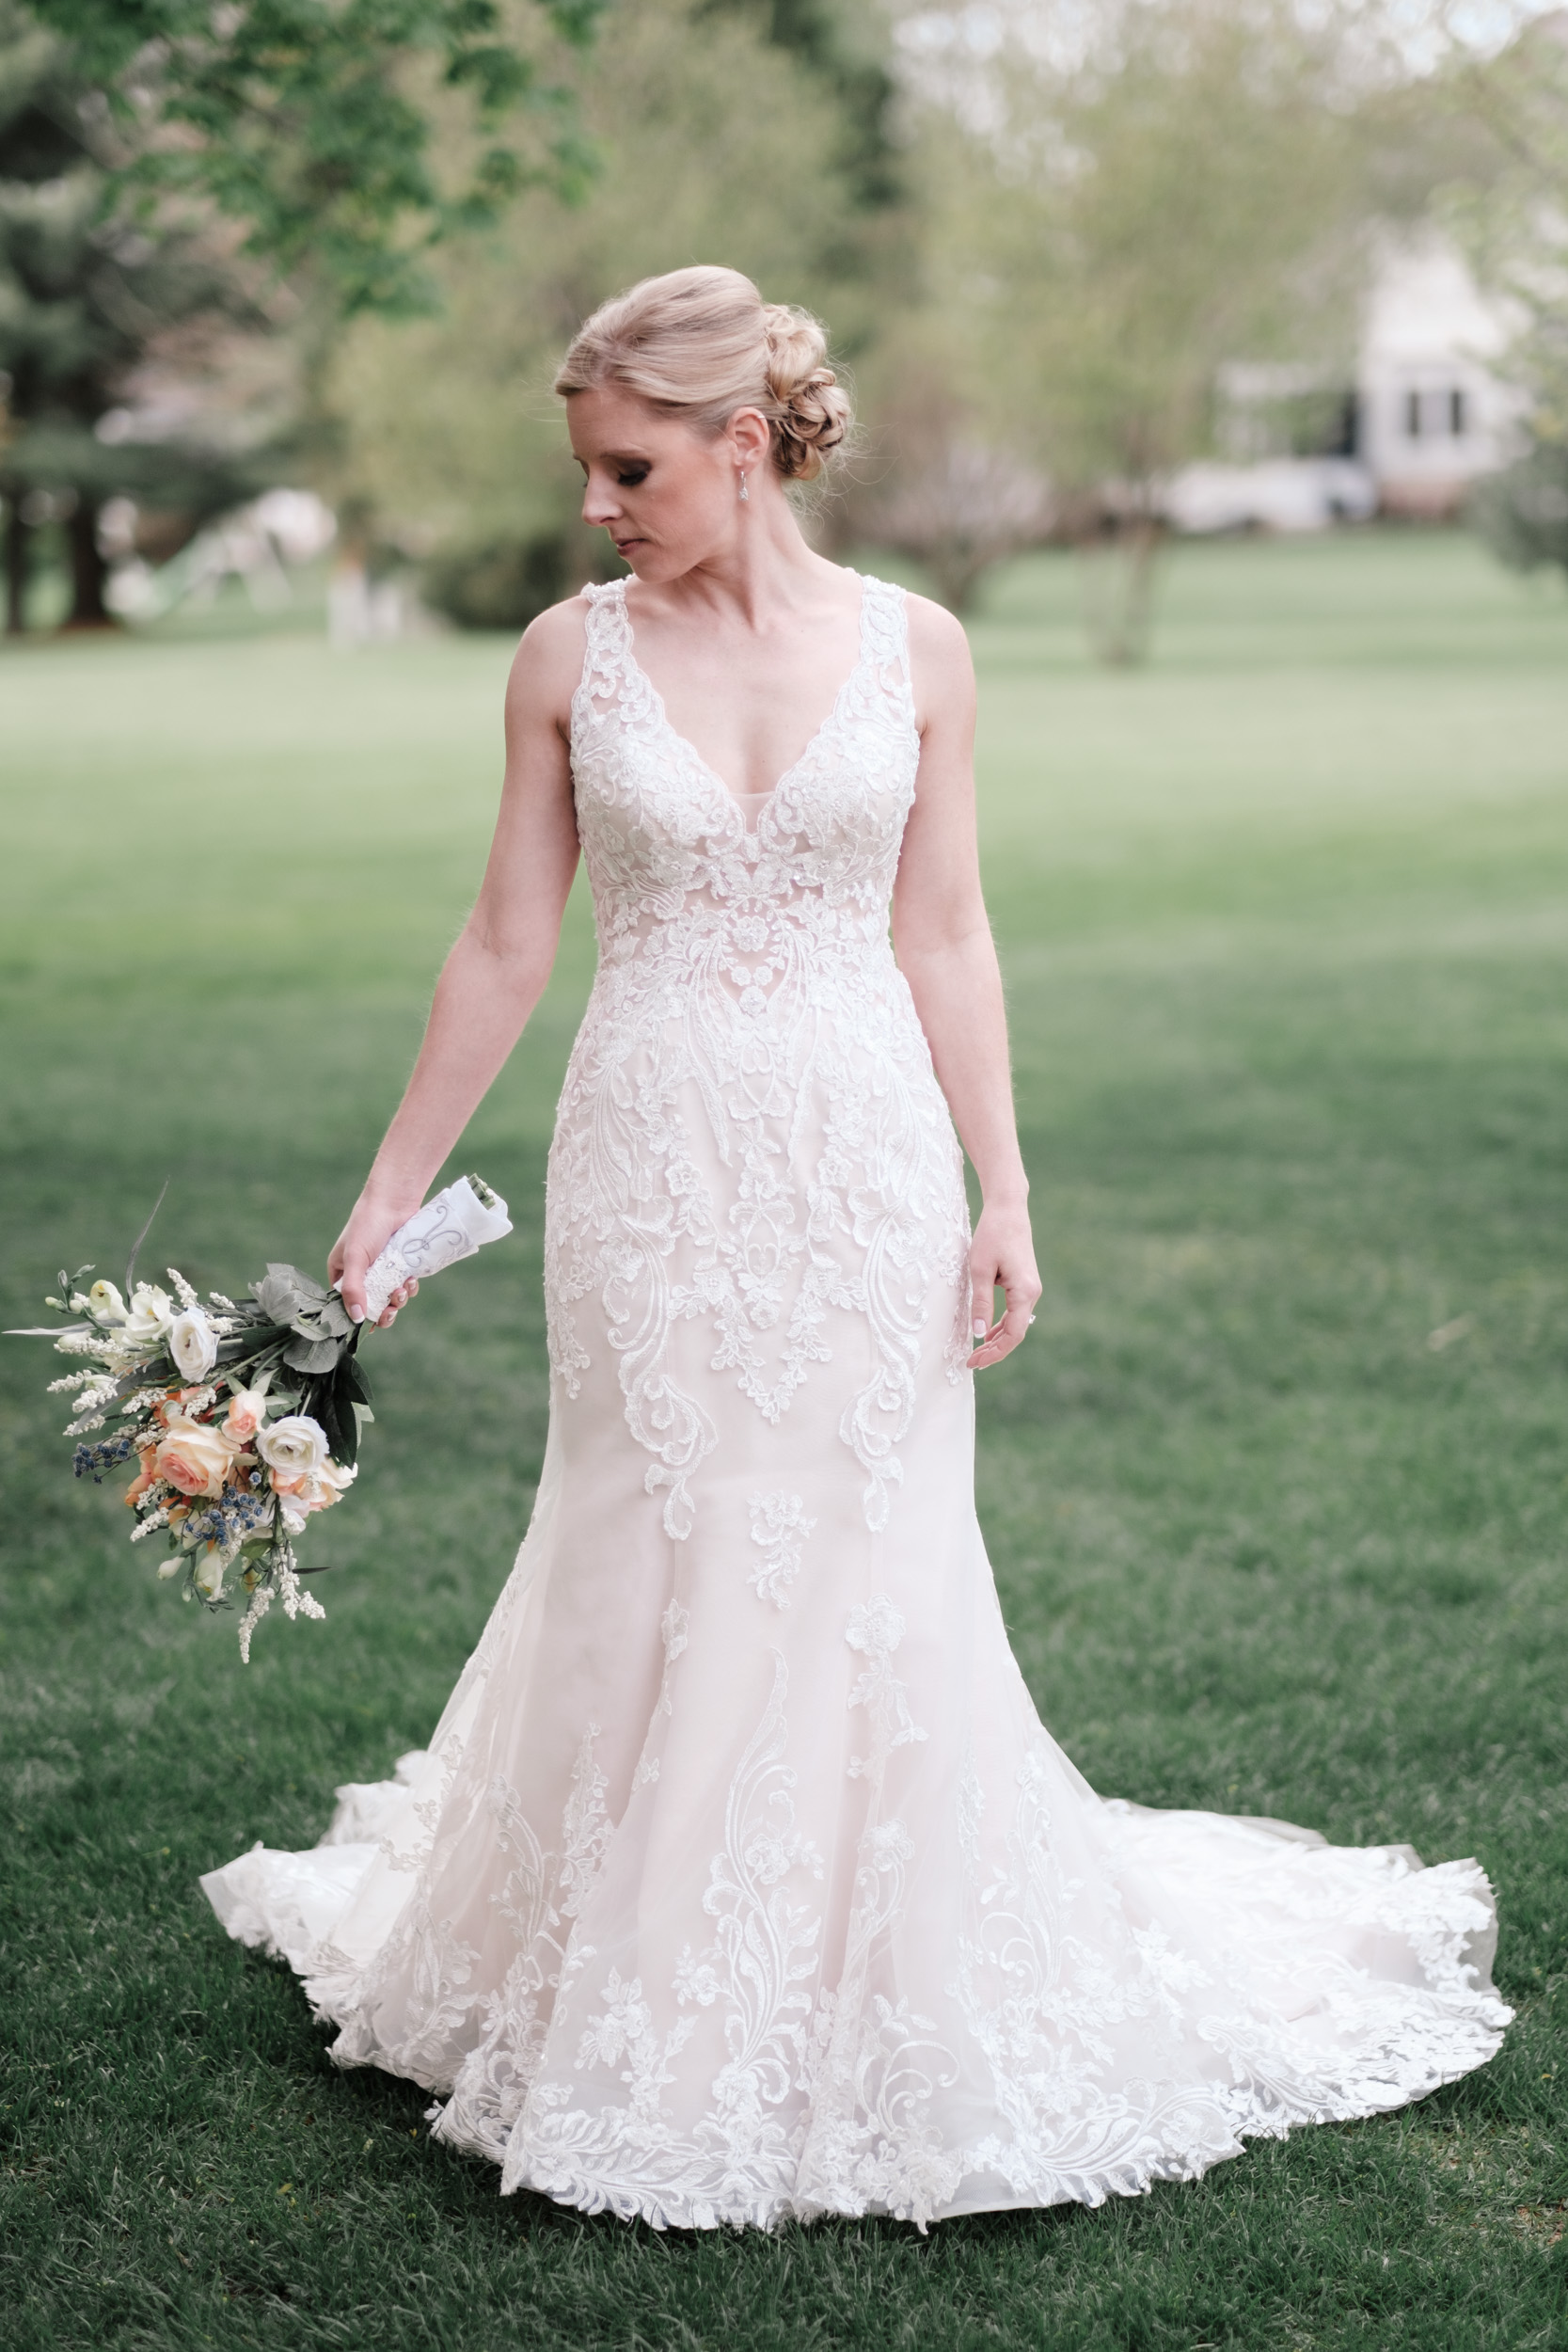 bridal portrait of blonde bride on wedding day open back wedding dress